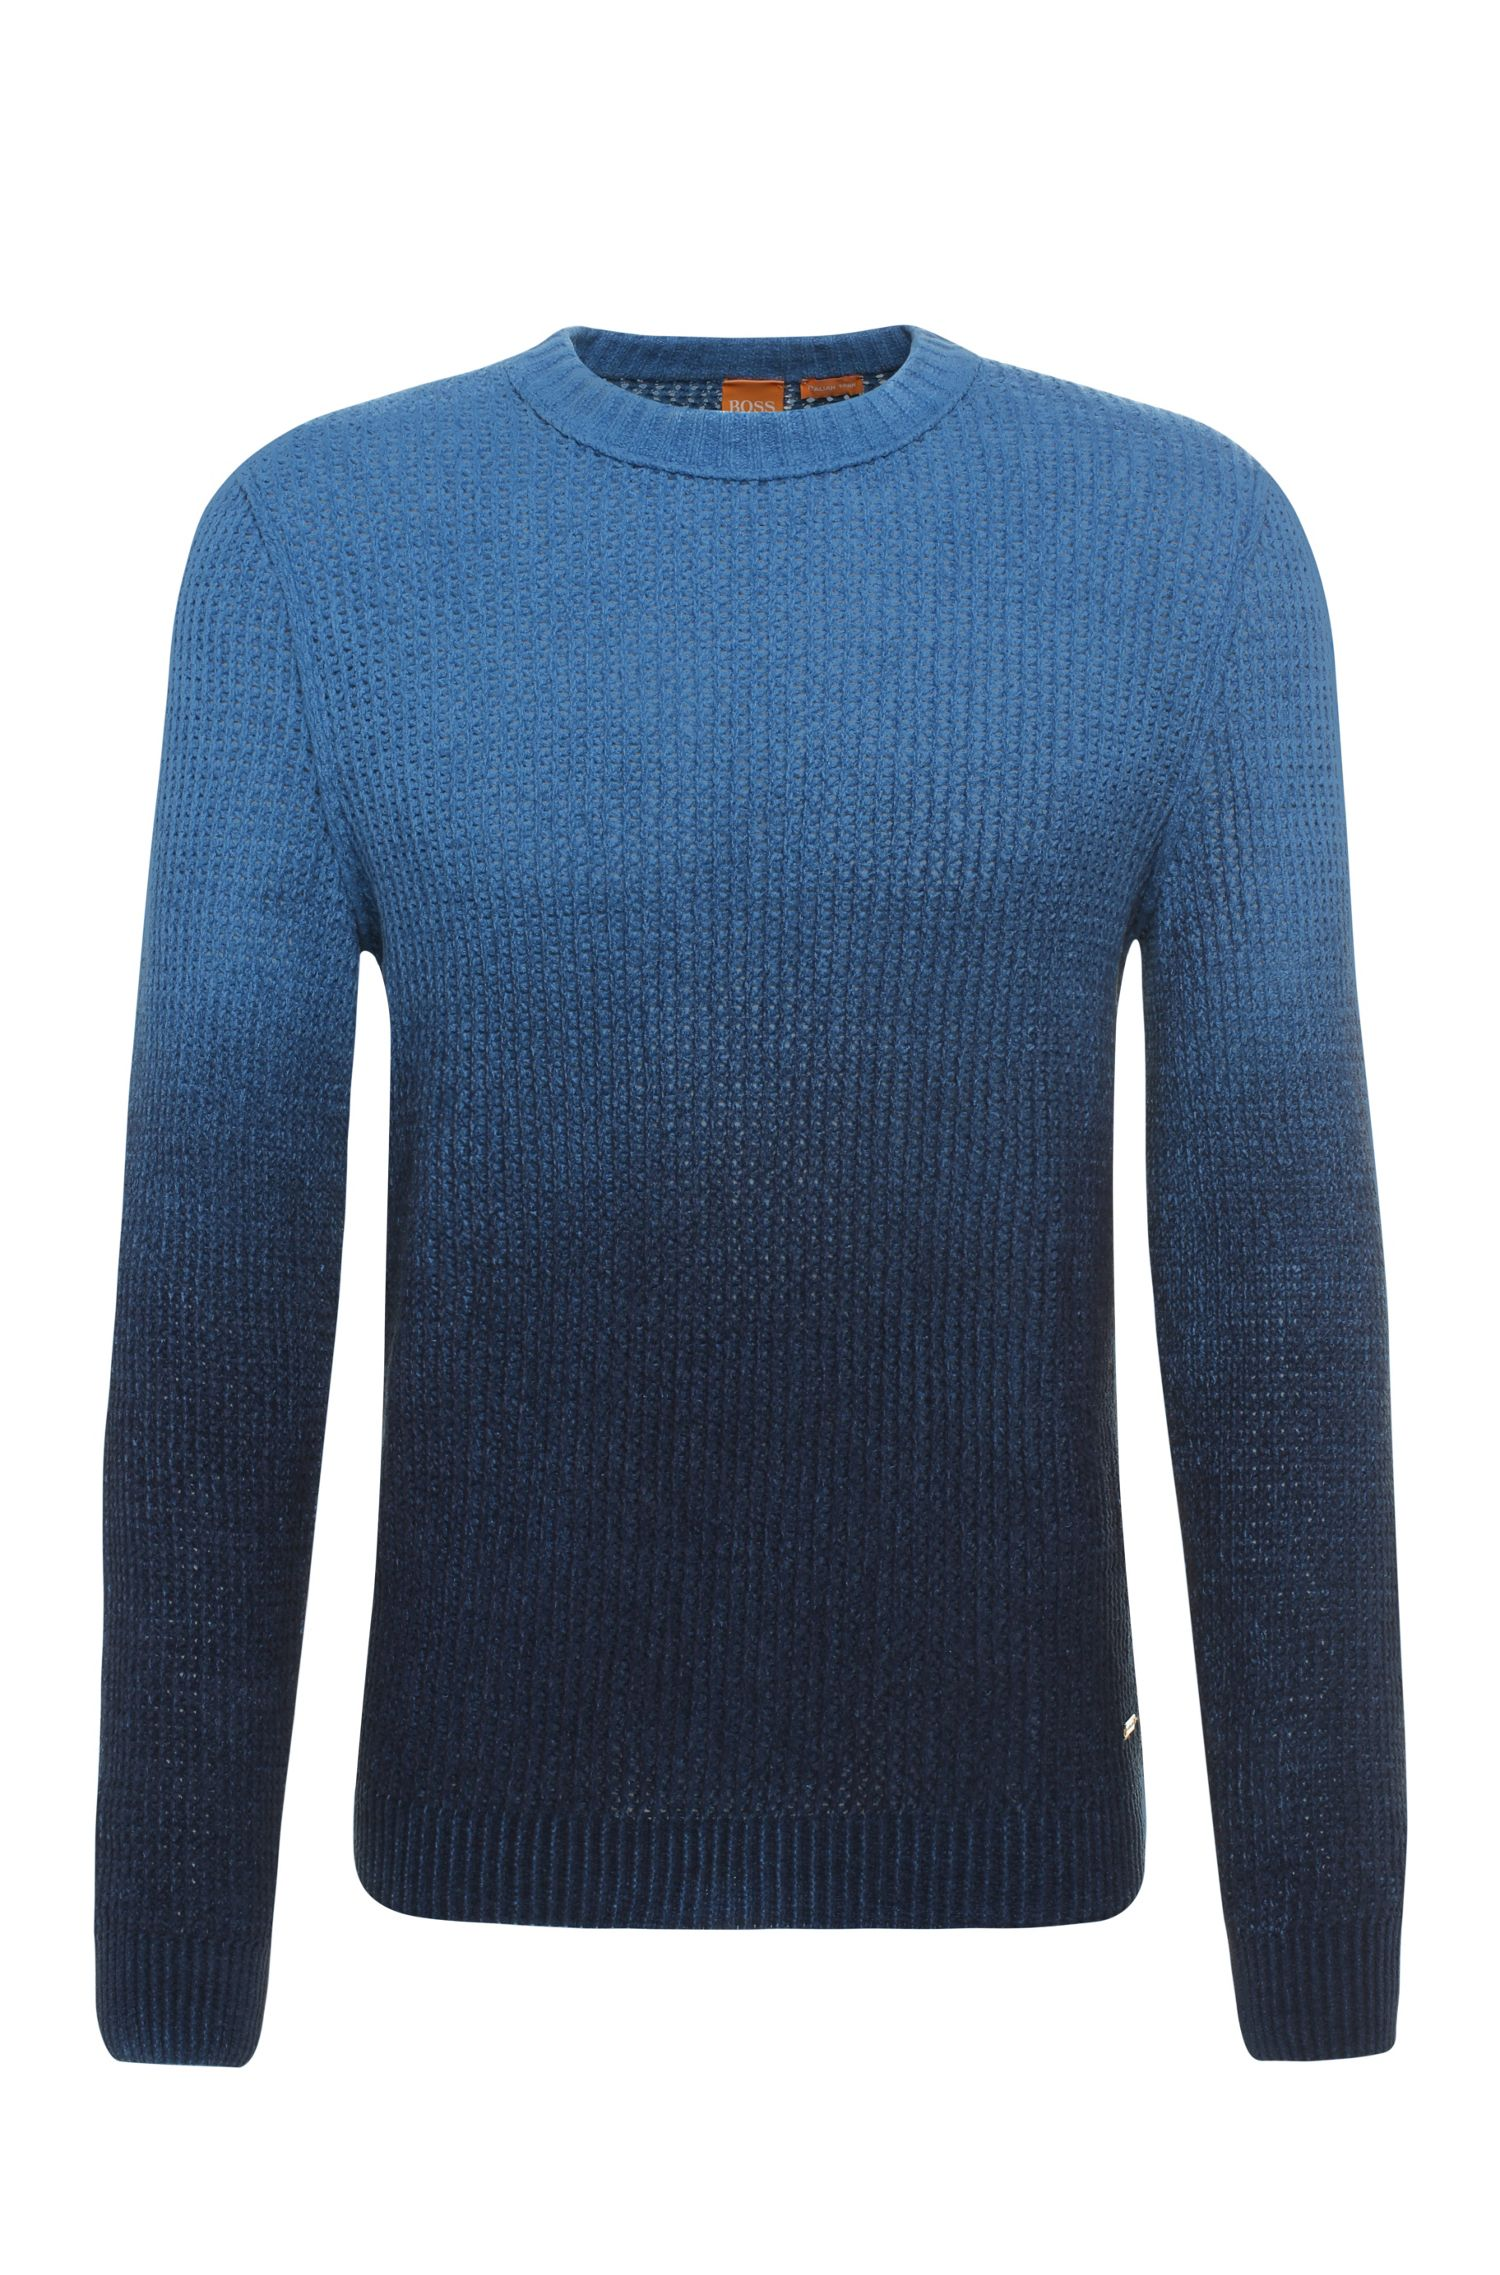 Gebreide slim-fit trui van katoen met licht kleurverloop: 'Kavigrado'